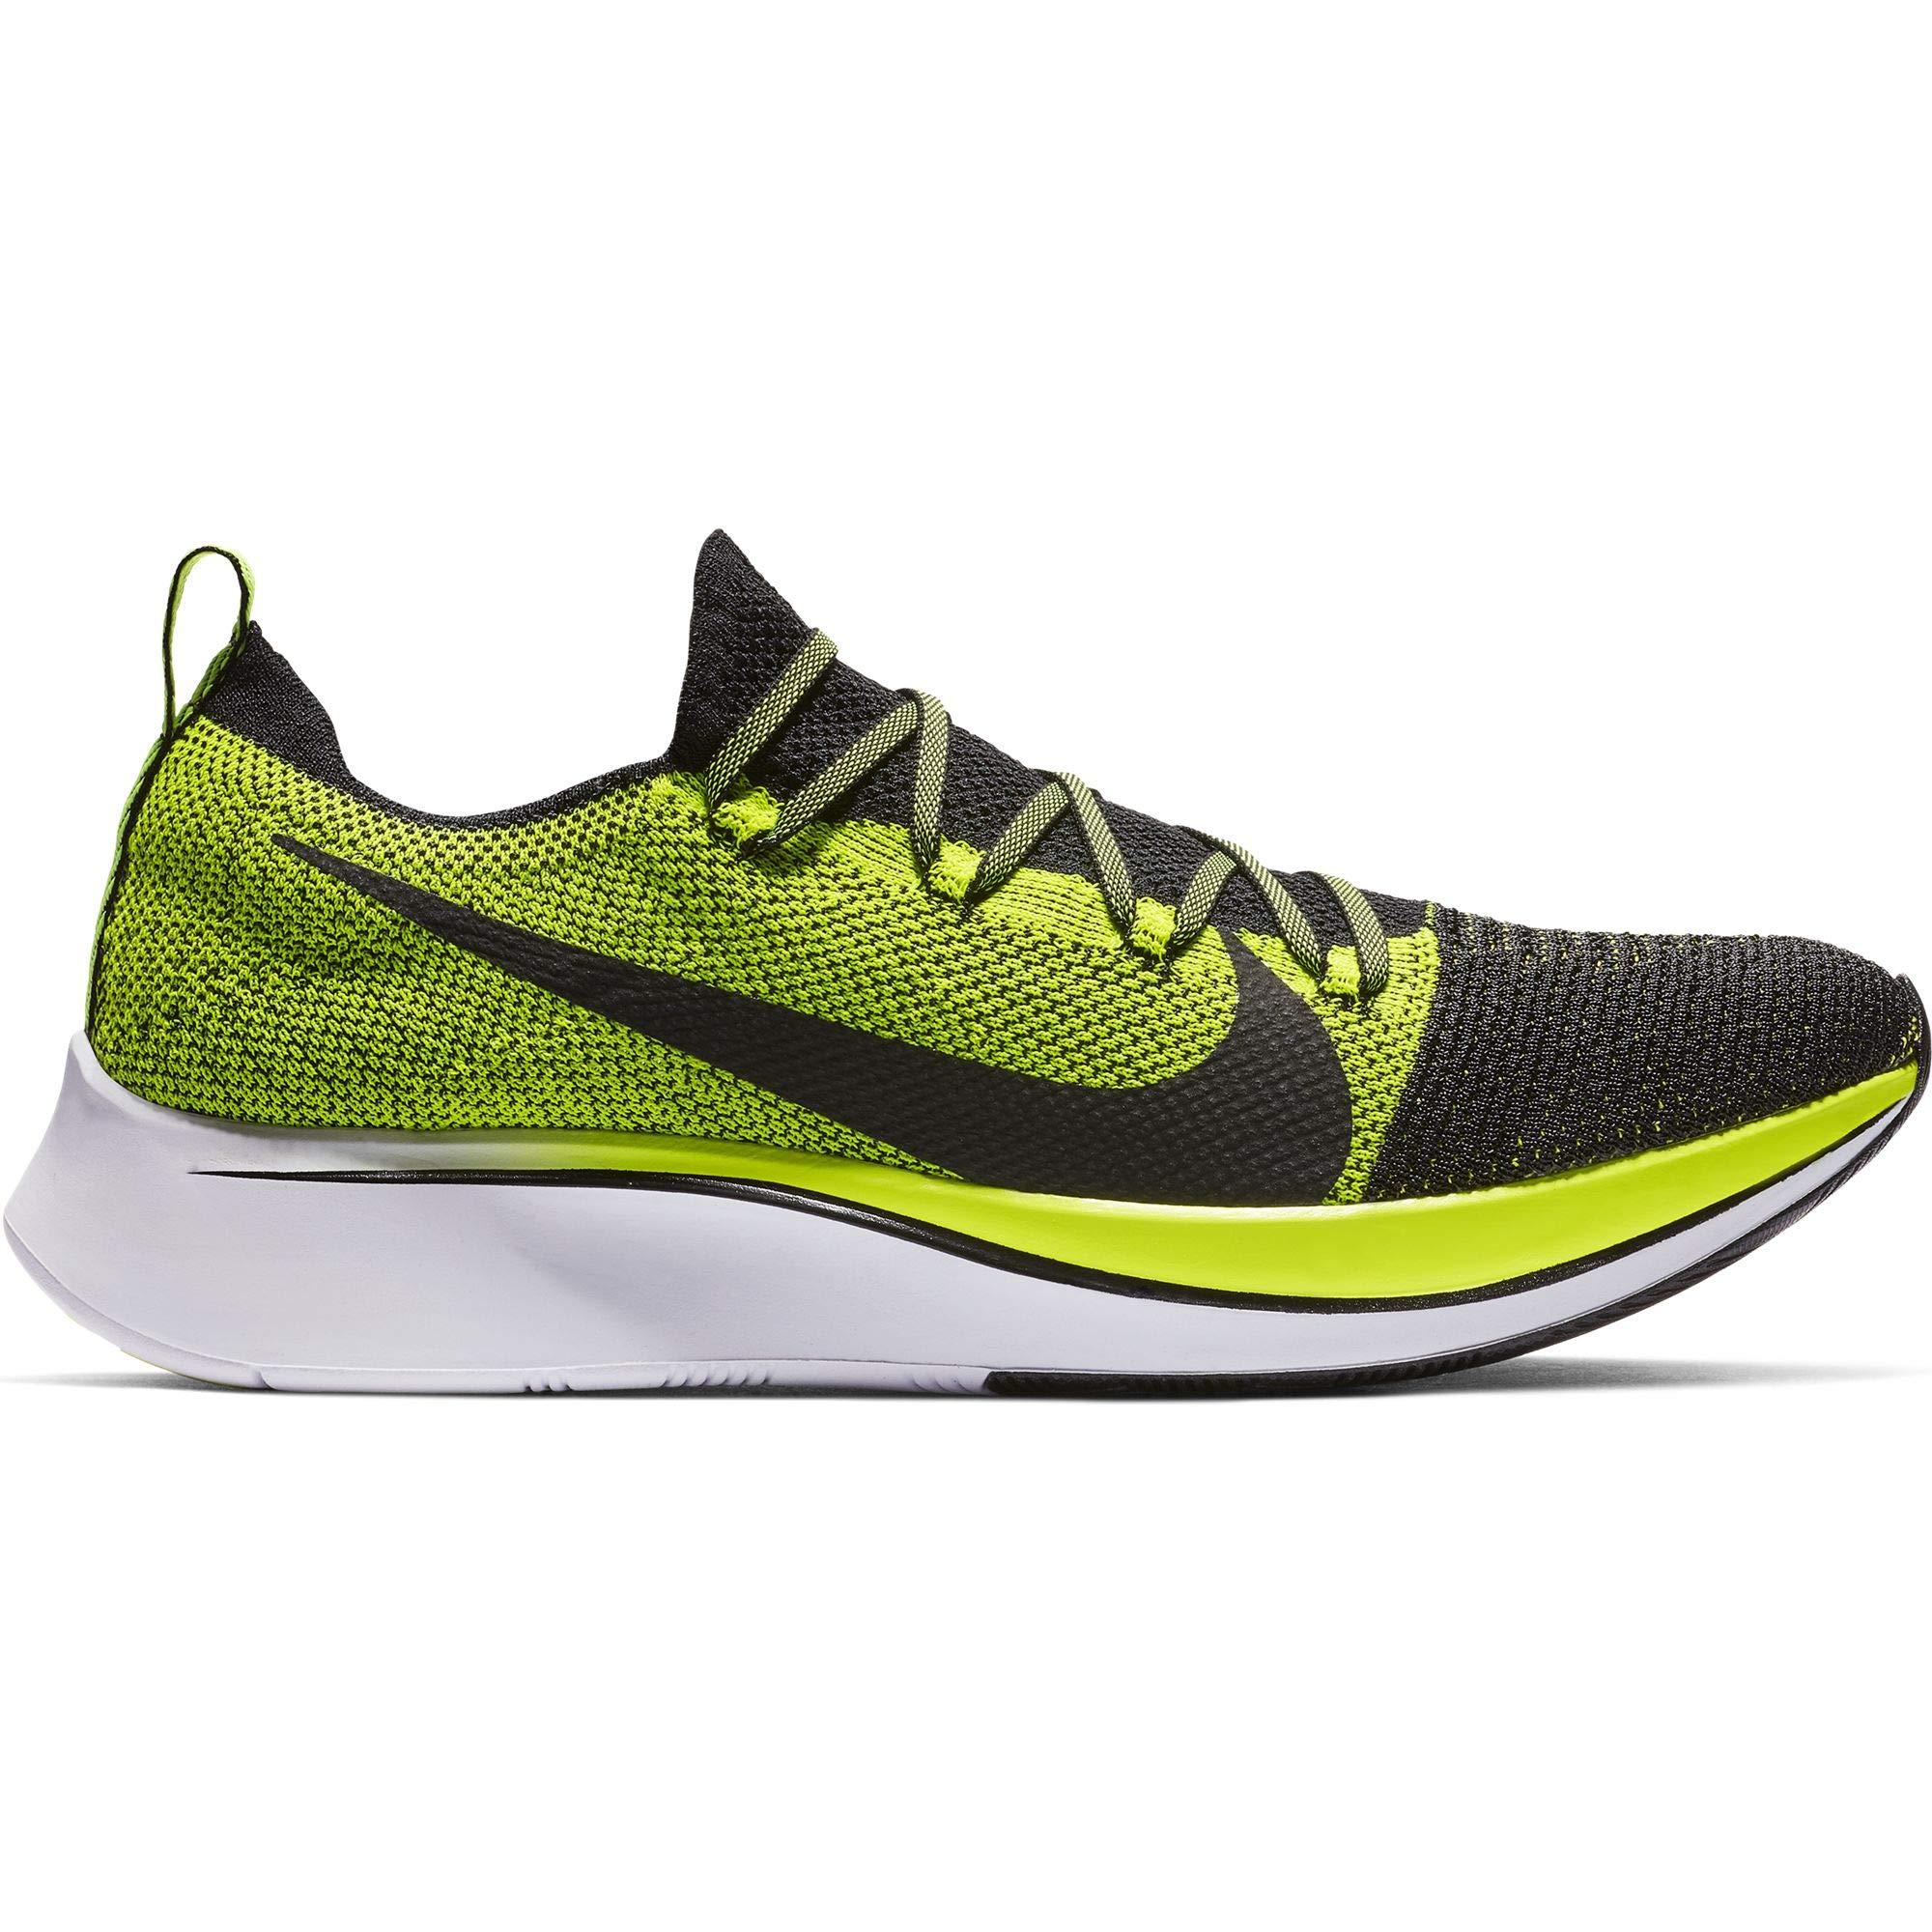 Nike Zoom Fly Flyknit Men's Running Shoe Black/Black-Volt-White Size 8 by Nike (Image #1)